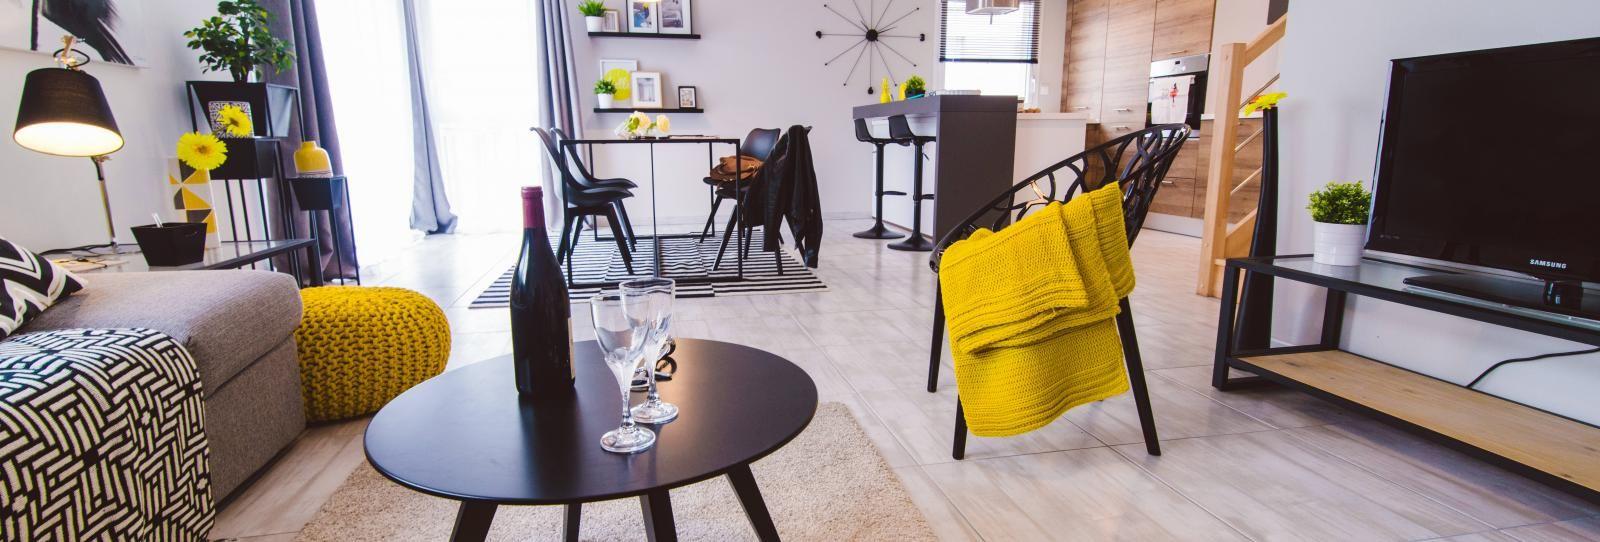 Appartement Duplex Jardin Temoin Proche De Strasbourg Appartement Temoin Appartement Duplex Appartement